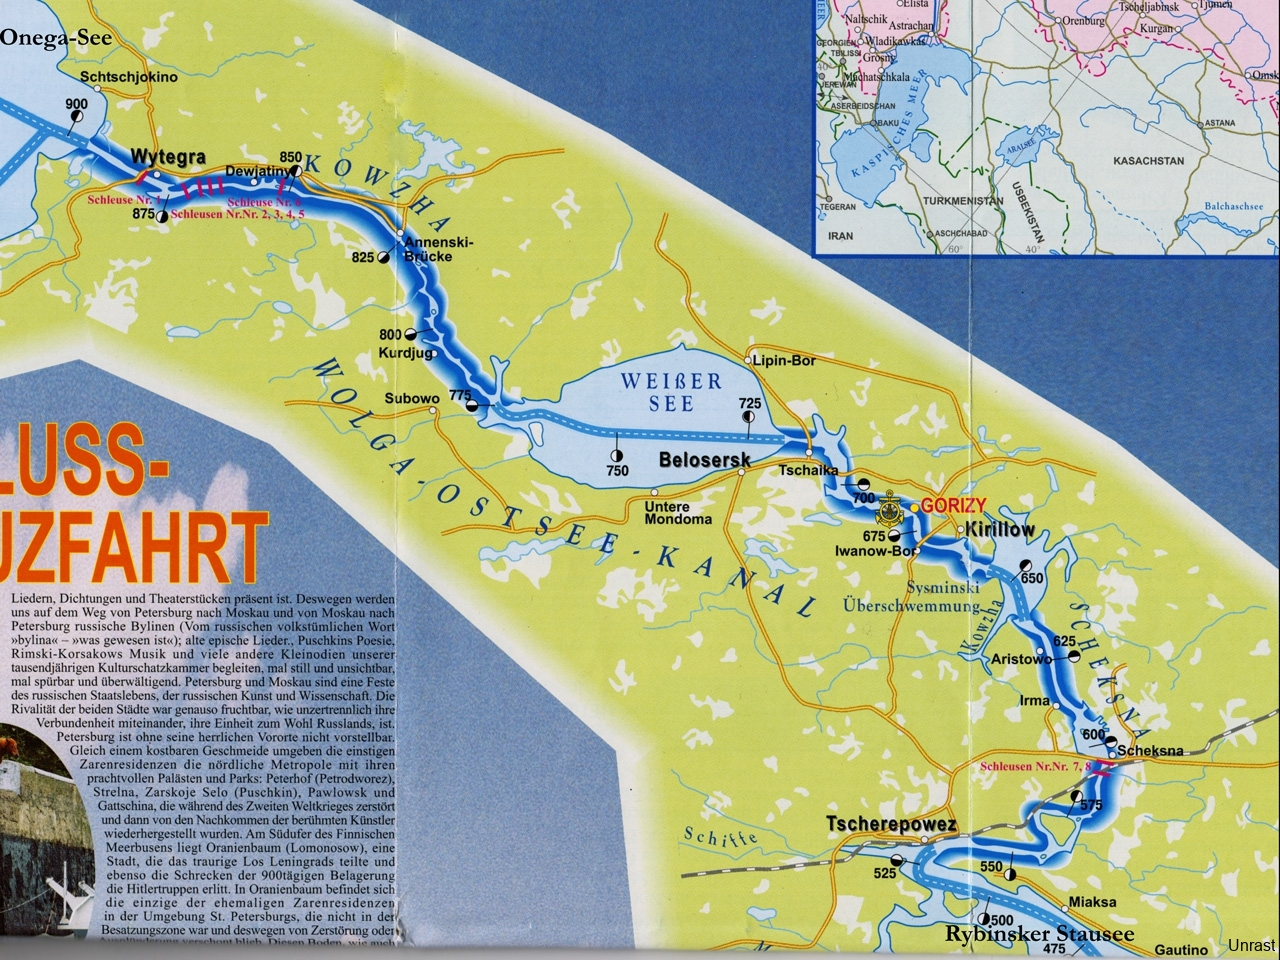 Wolga-Ostsee Kanal